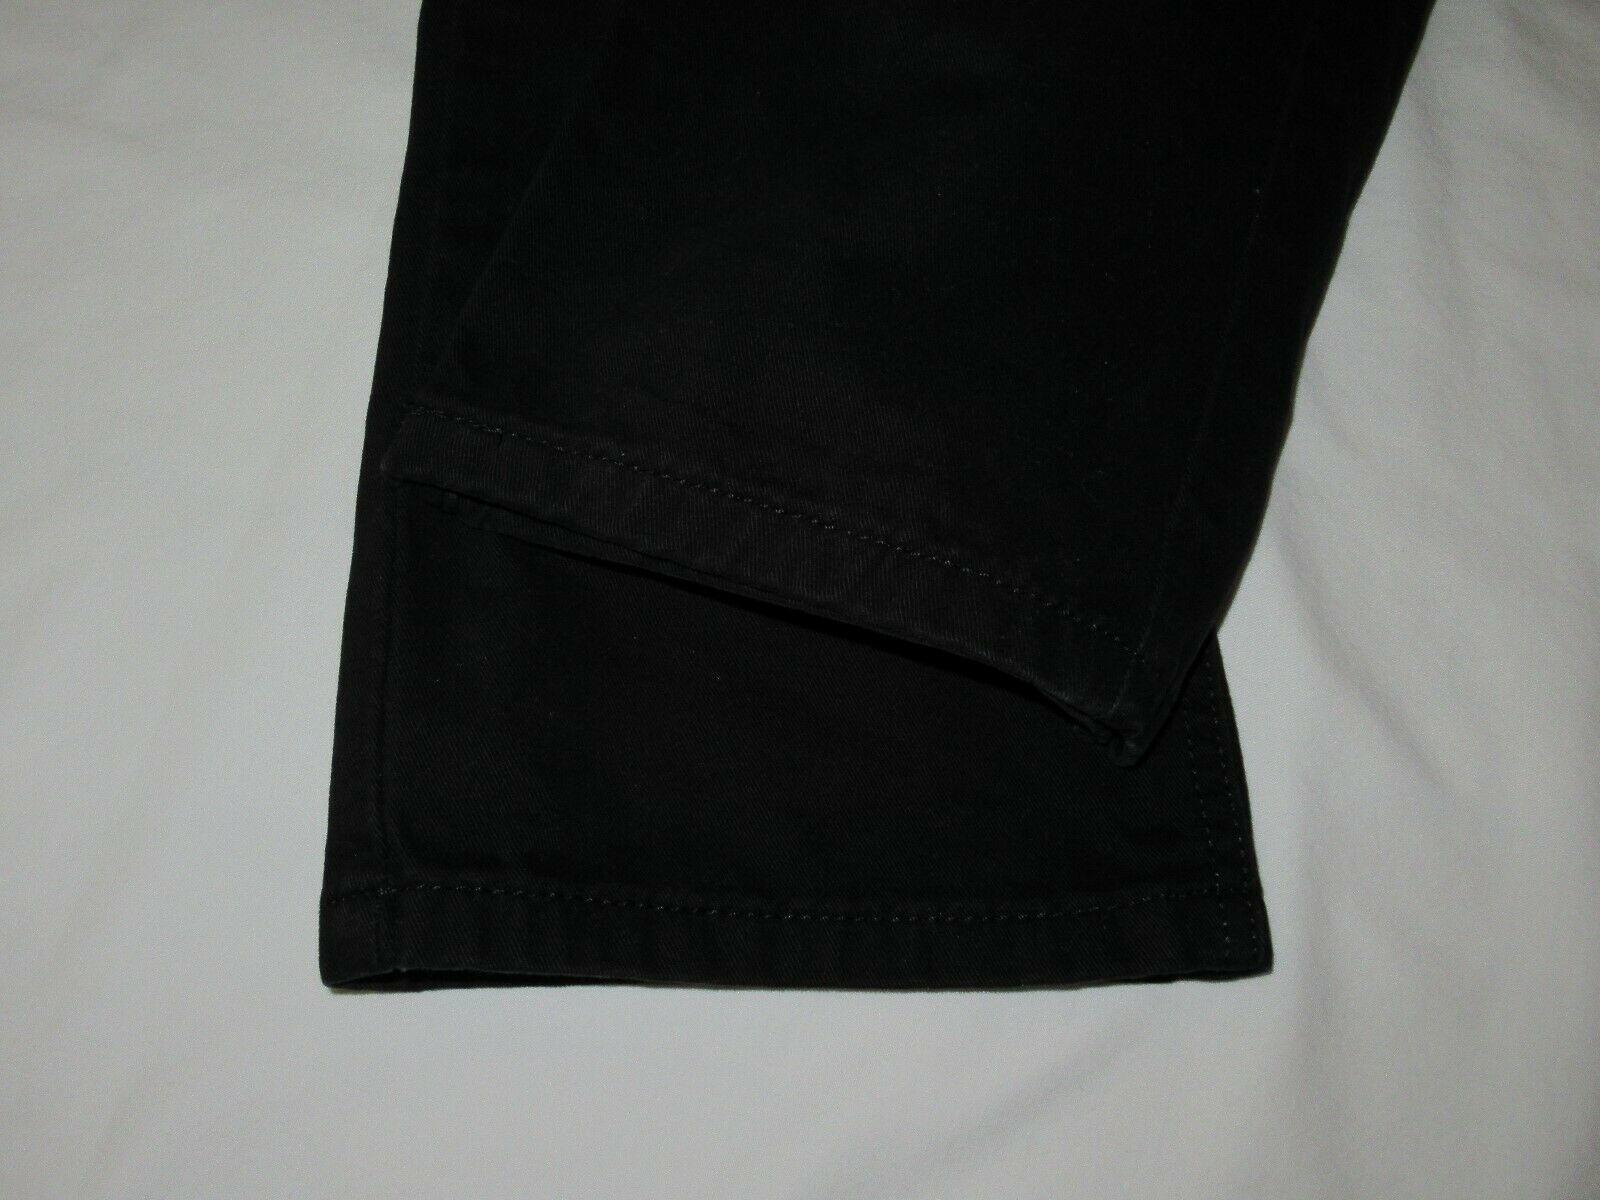 Boys Levis 505 Straight Black Denim Jeans Size 10 Reg Short! Brushed Cotton Warm image 9